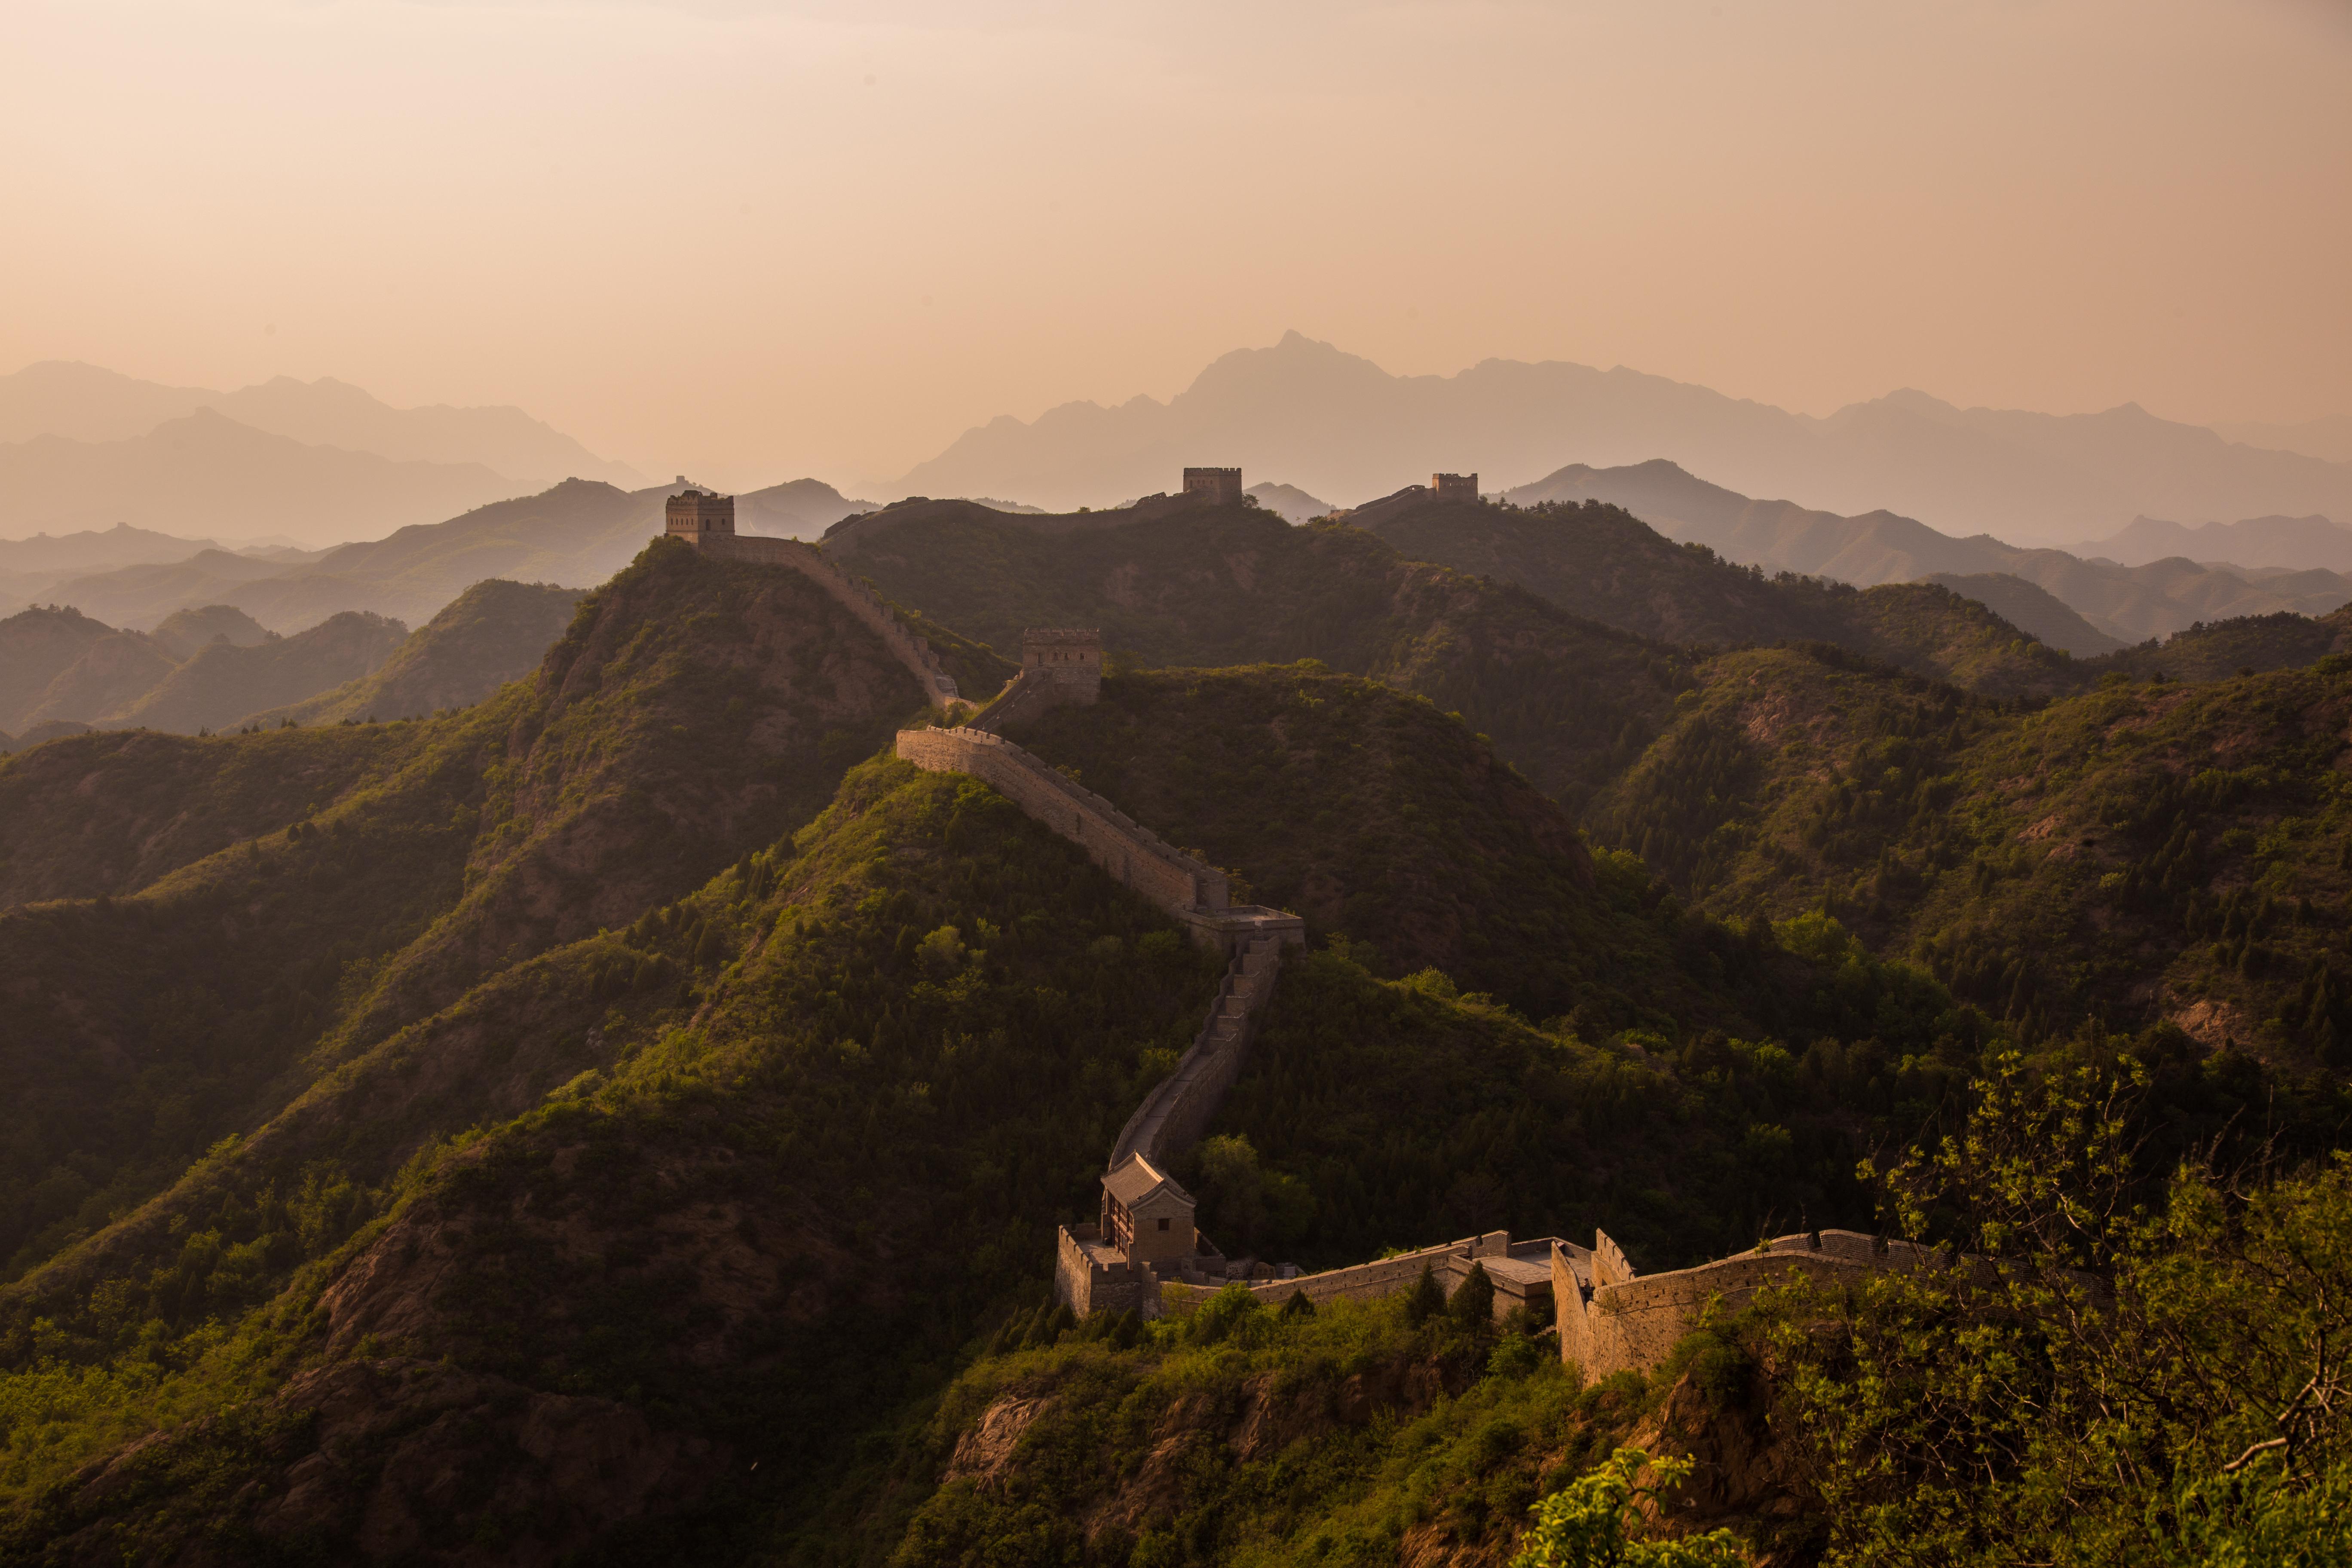 chine muraille montagnes